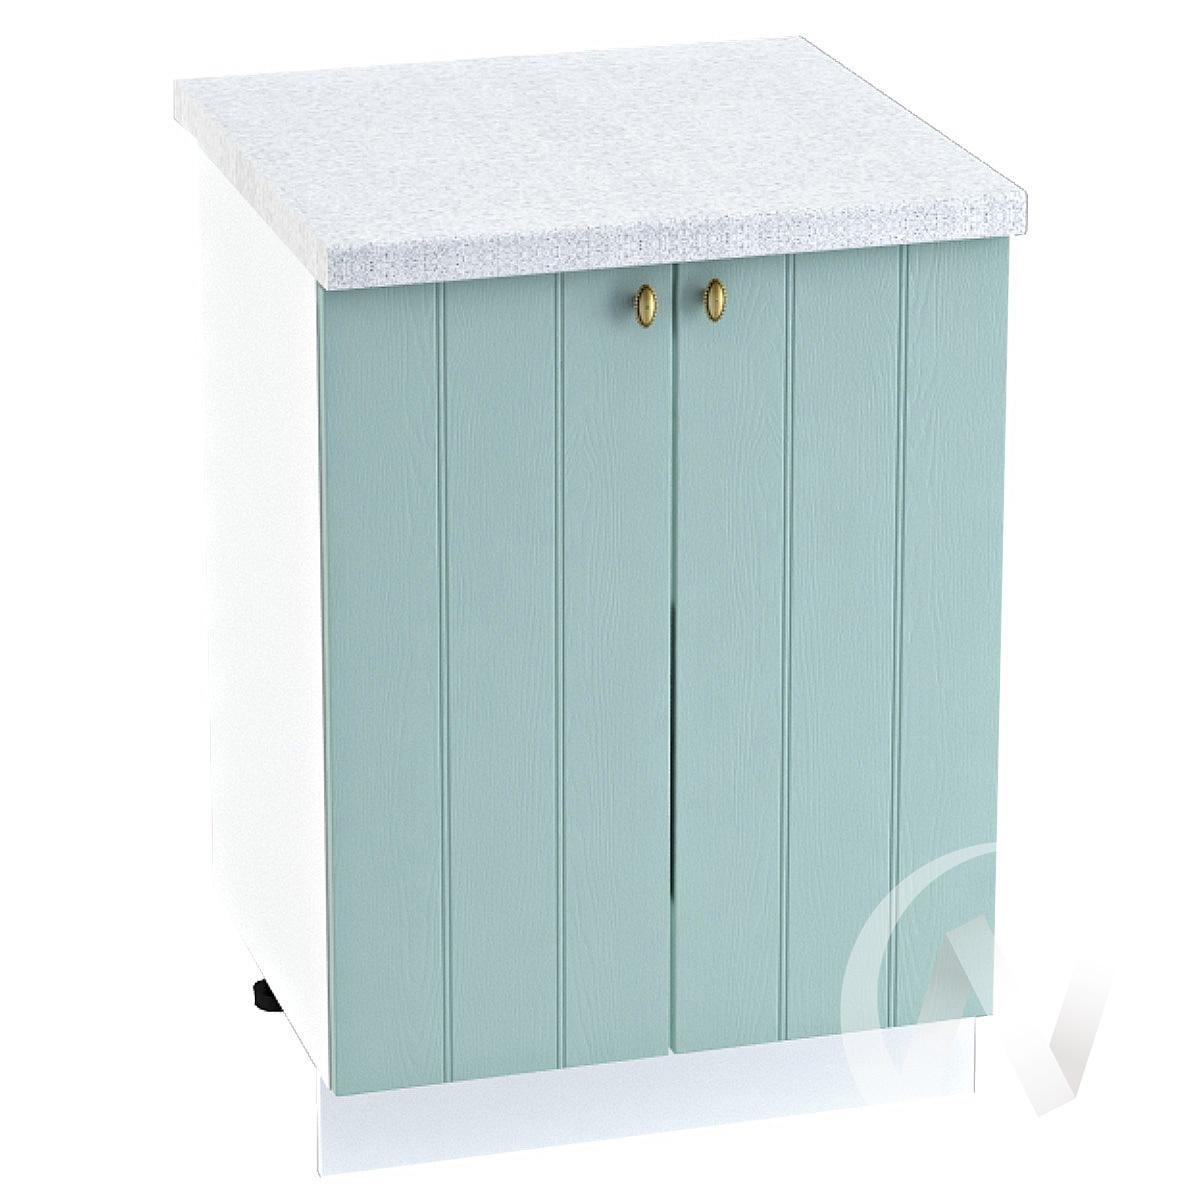 "Кухня ""Прованс"": Шкаф нижний 600, ШН 600 (голубой/корпус белый)"